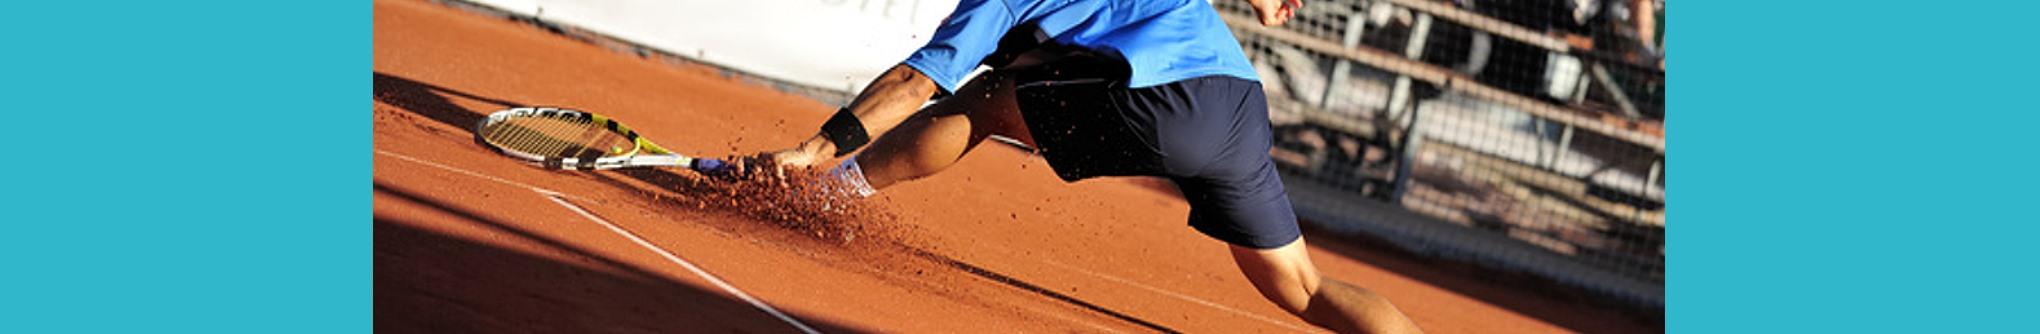 Tennisplatz-Ratgeber